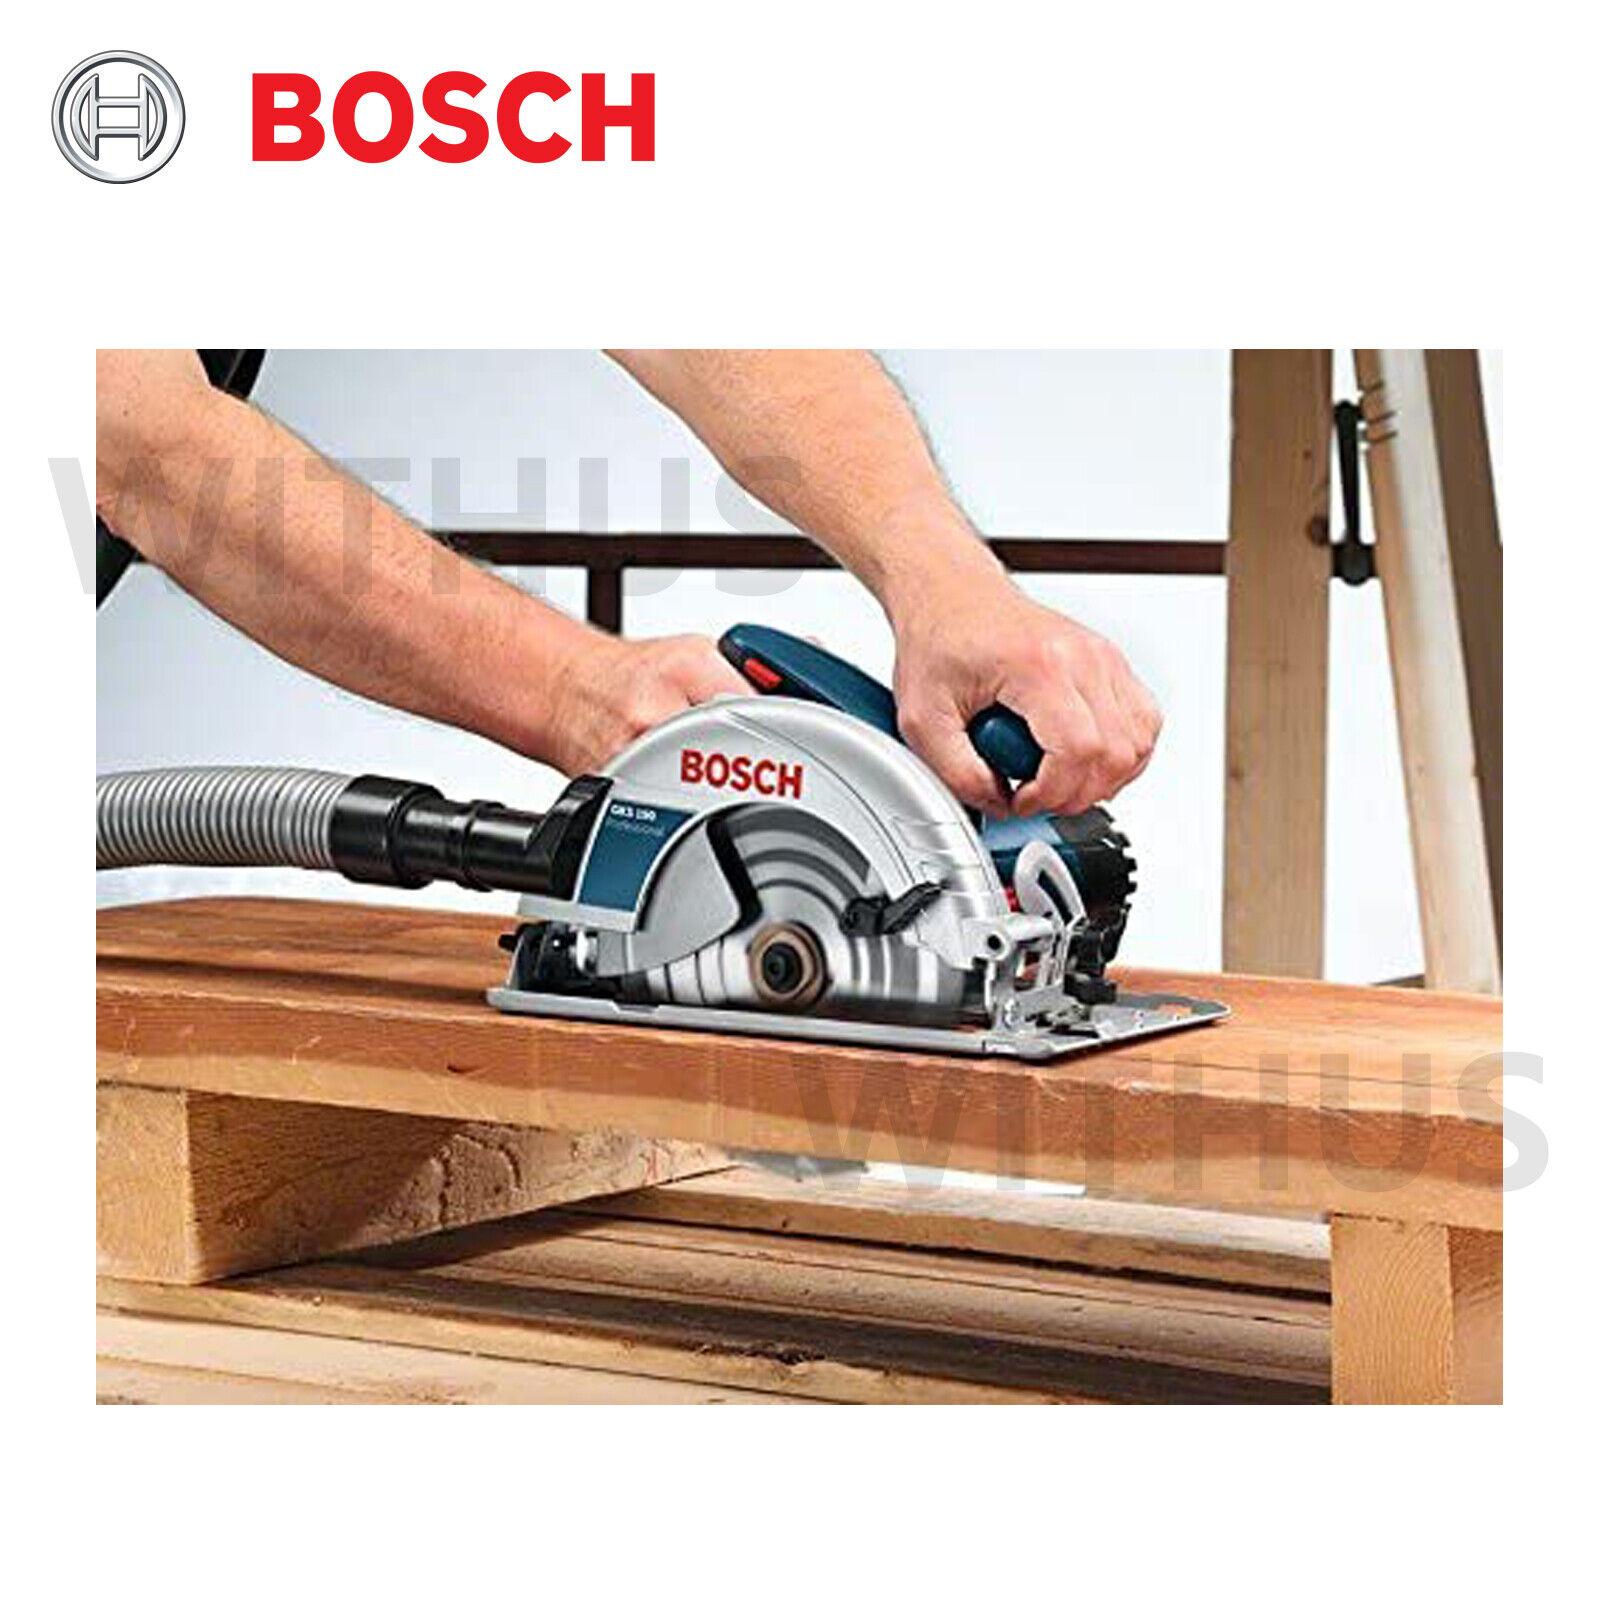 1619P06345 Armature For Bosch GKS 190 Circular Saw  220V